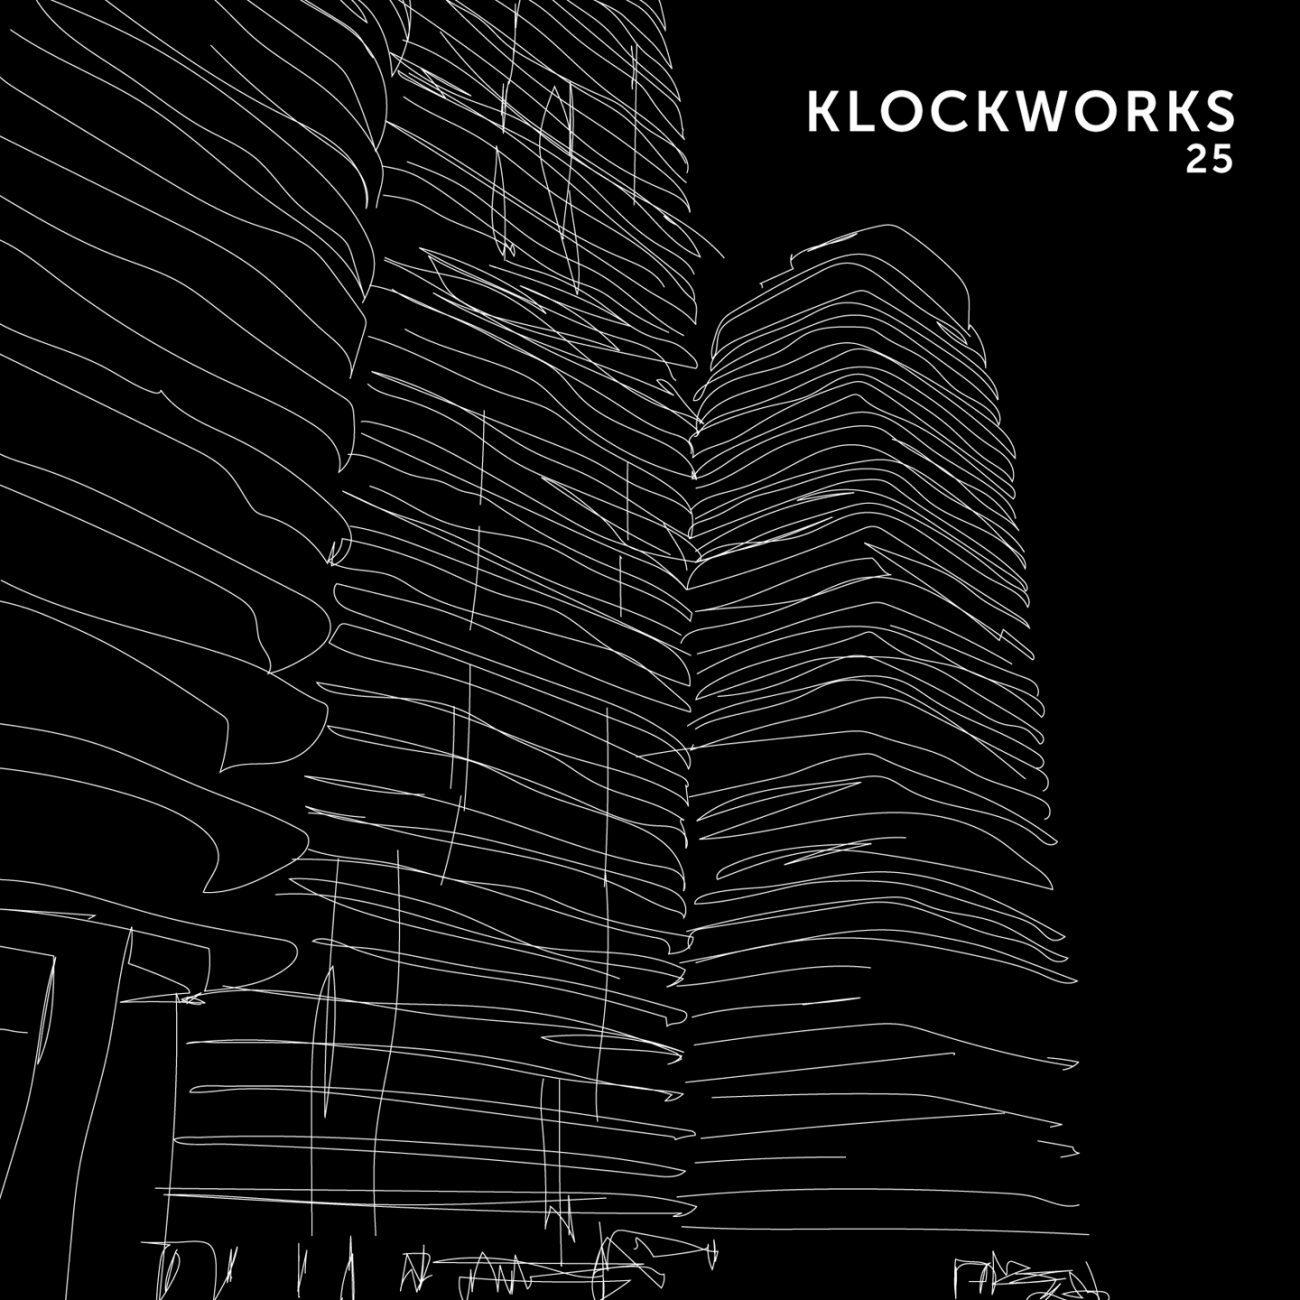 Newa – Klockworks 25 (Klockworks)